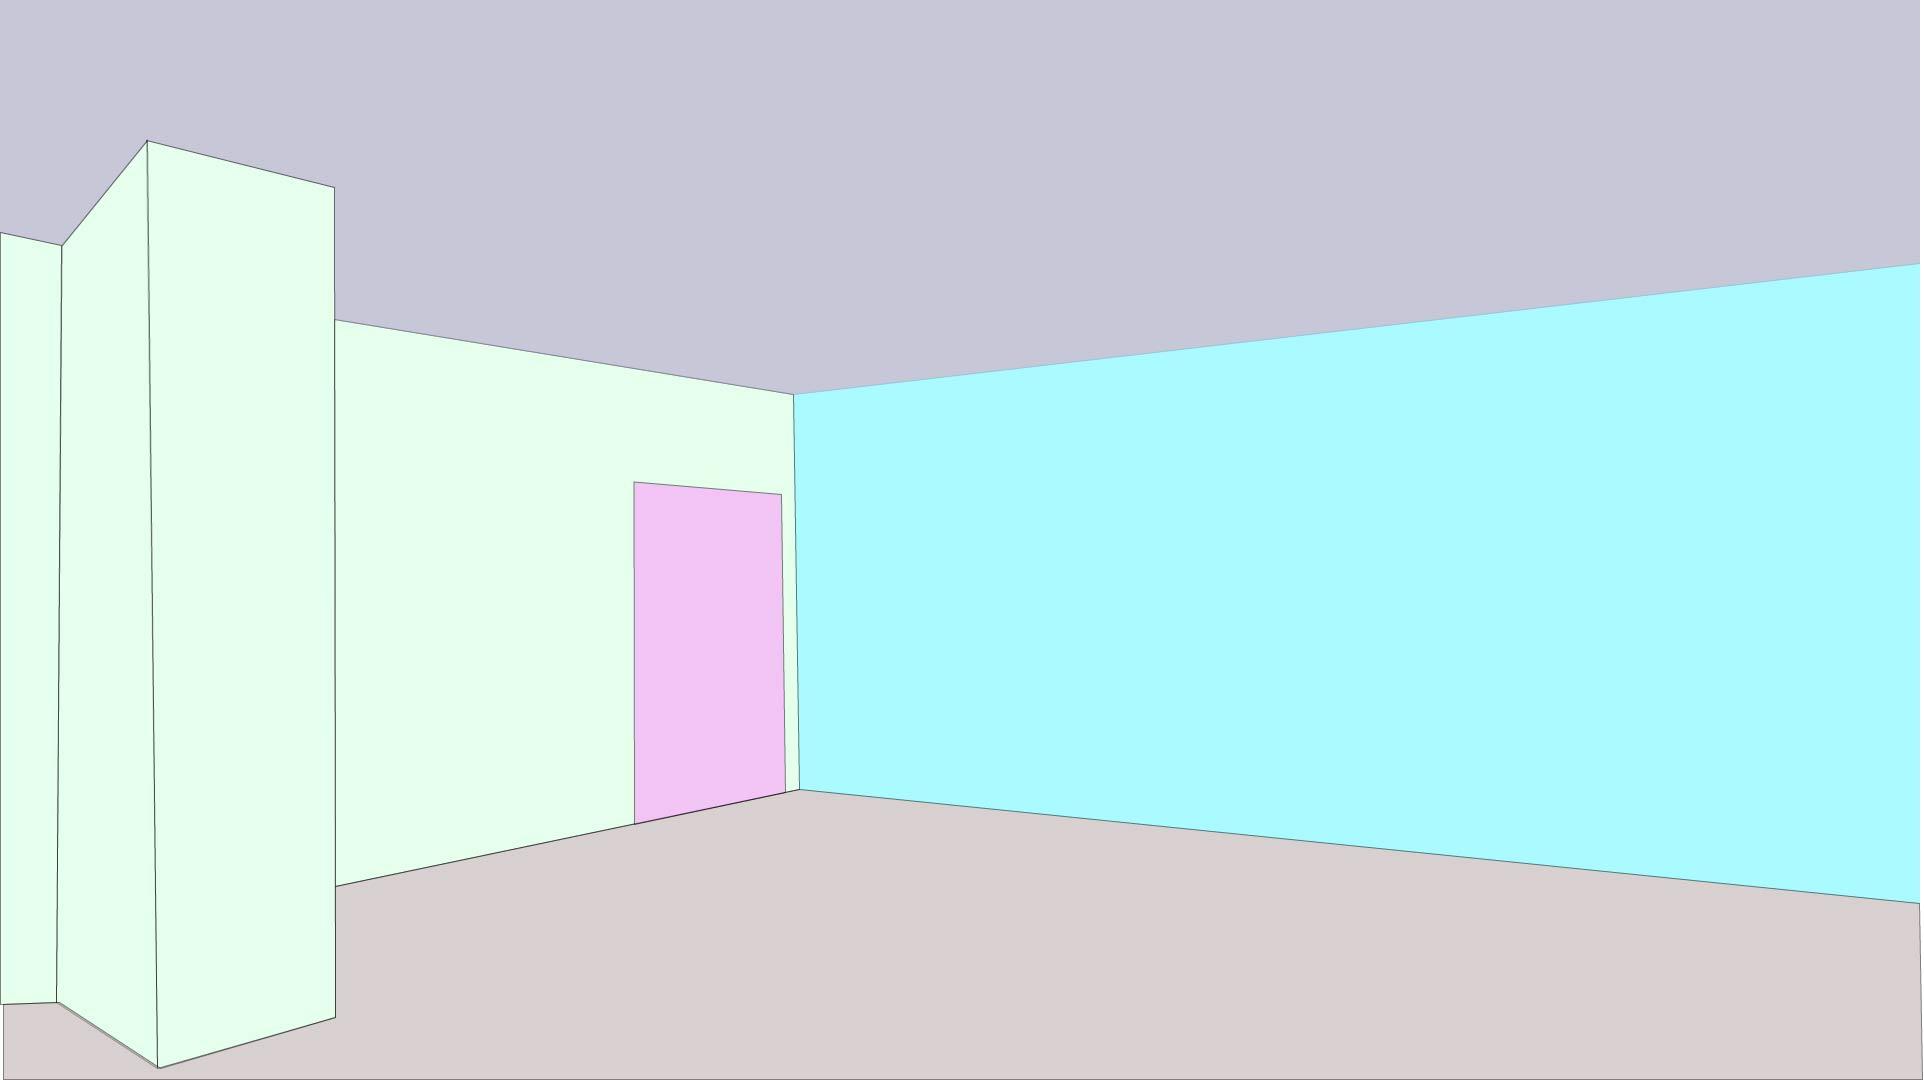 Designed Animated room.